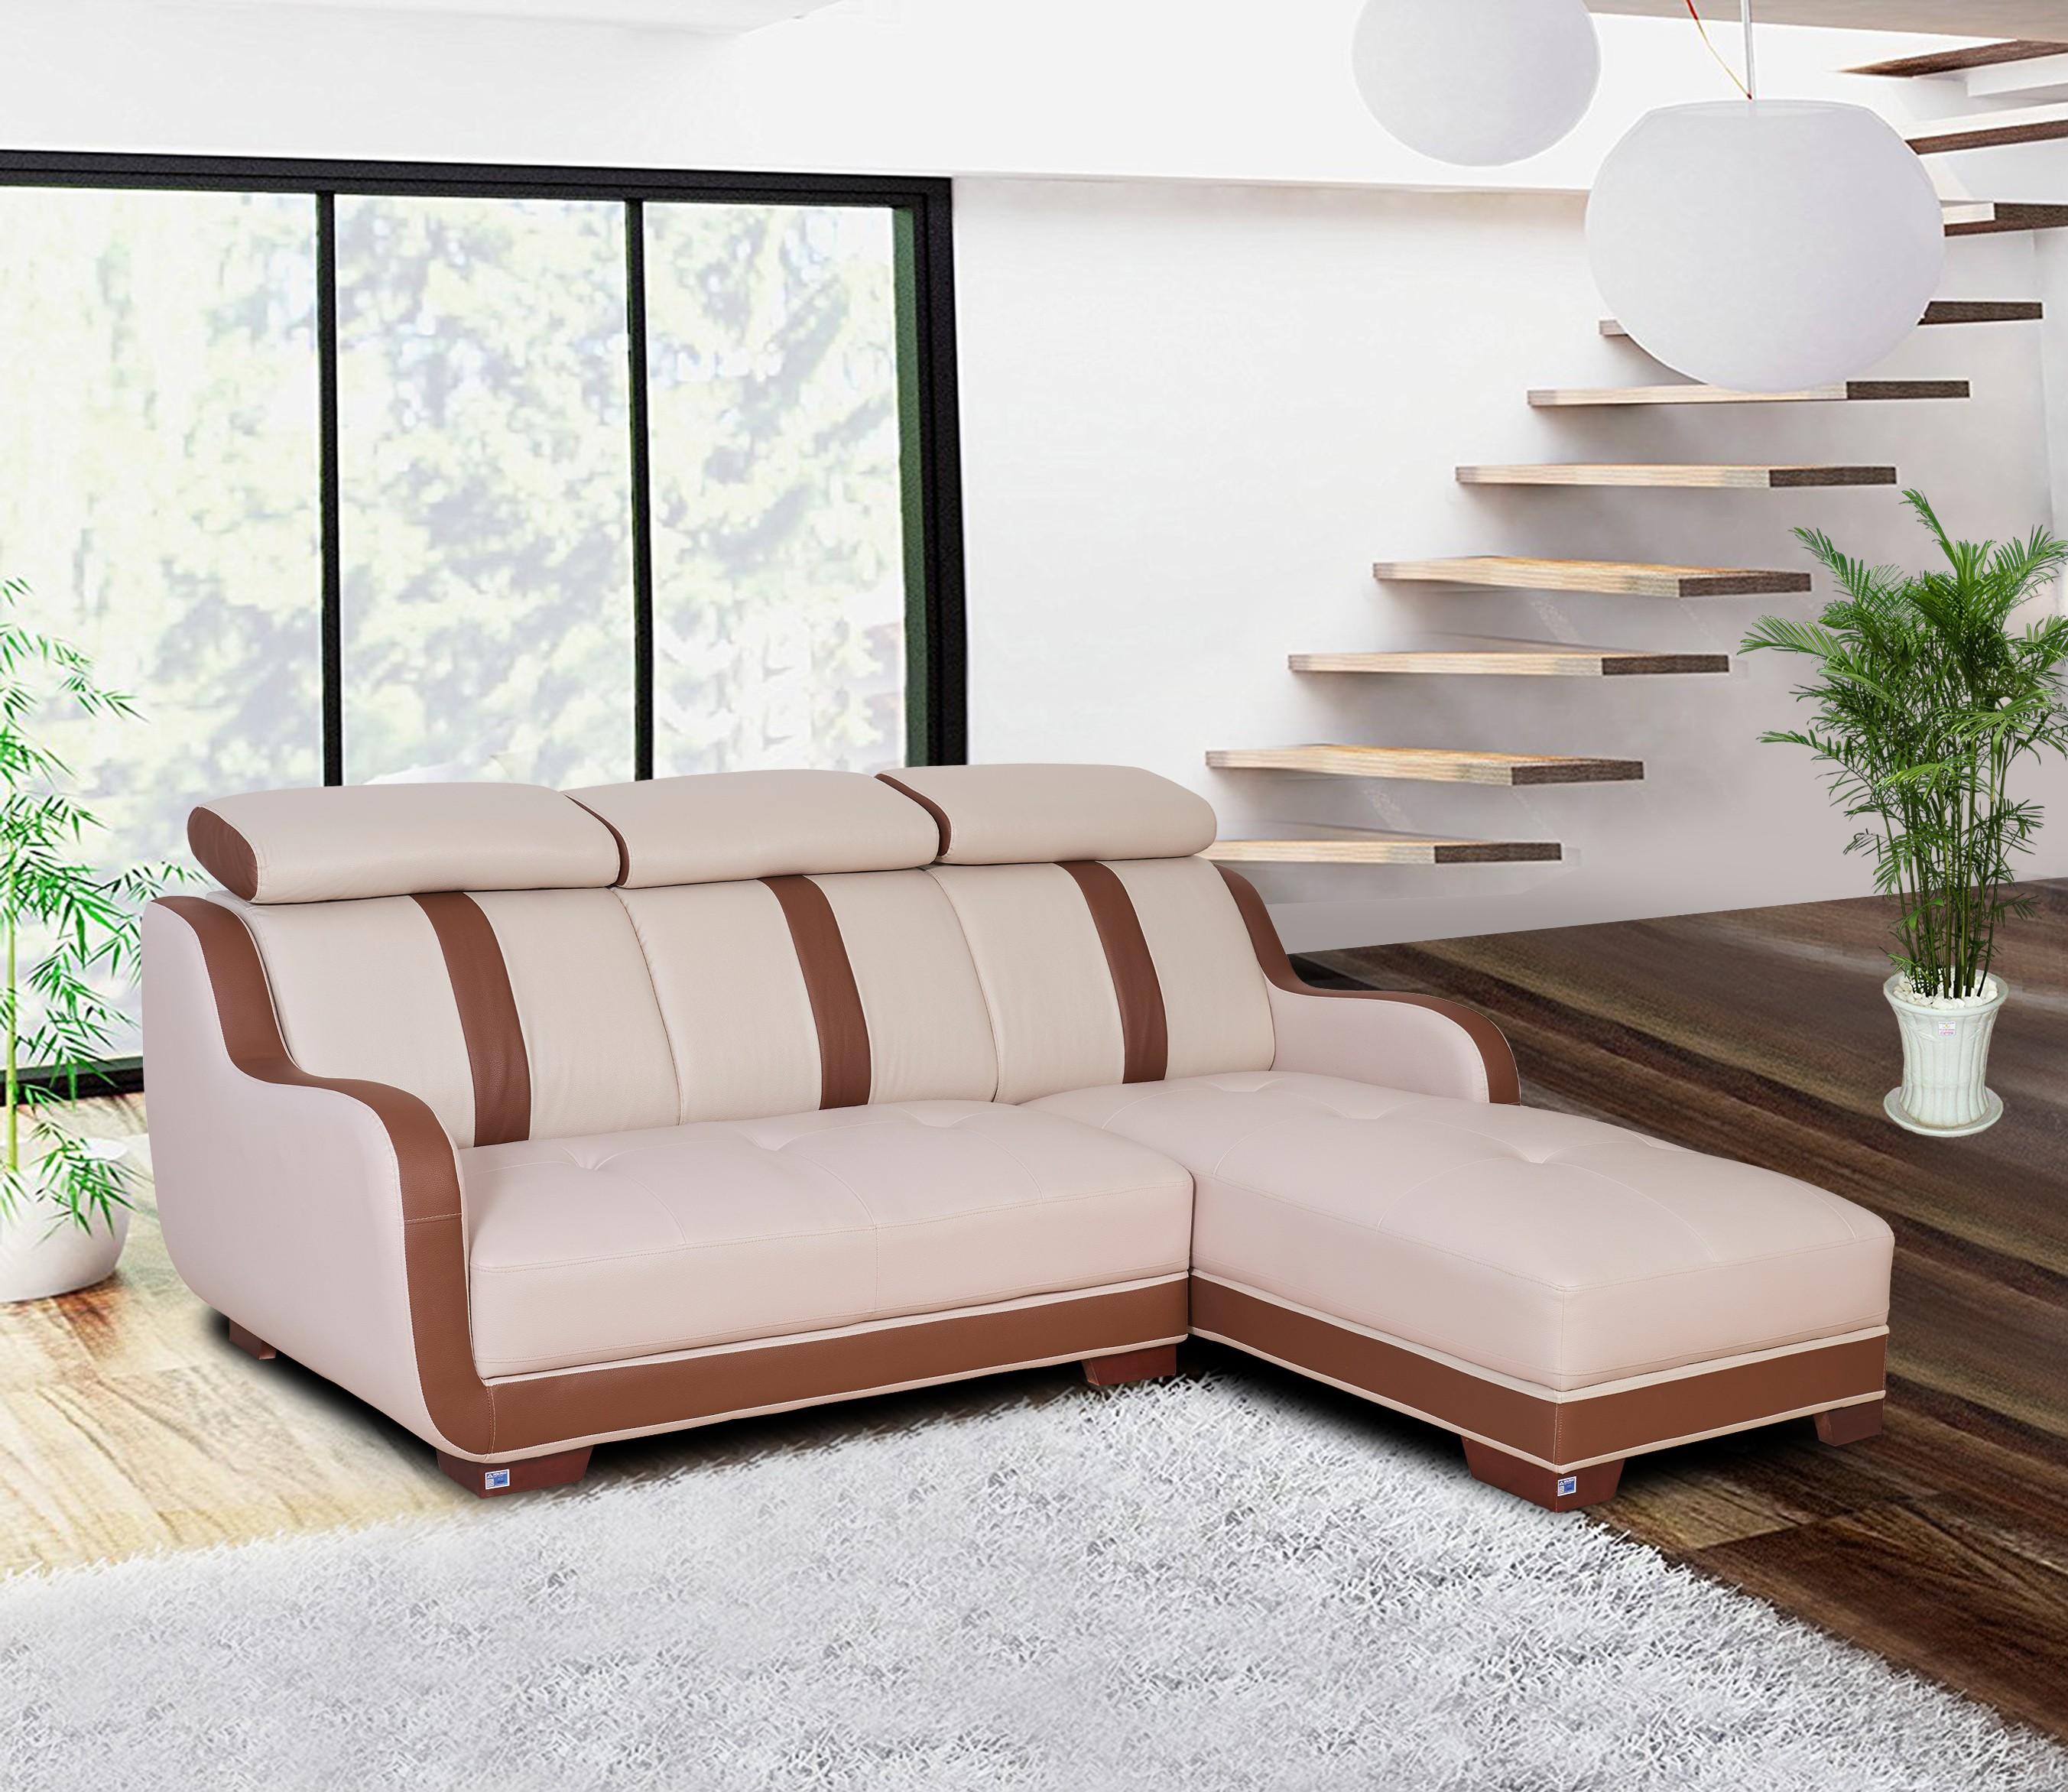 Ghế sofa 3 chỗ ngồi